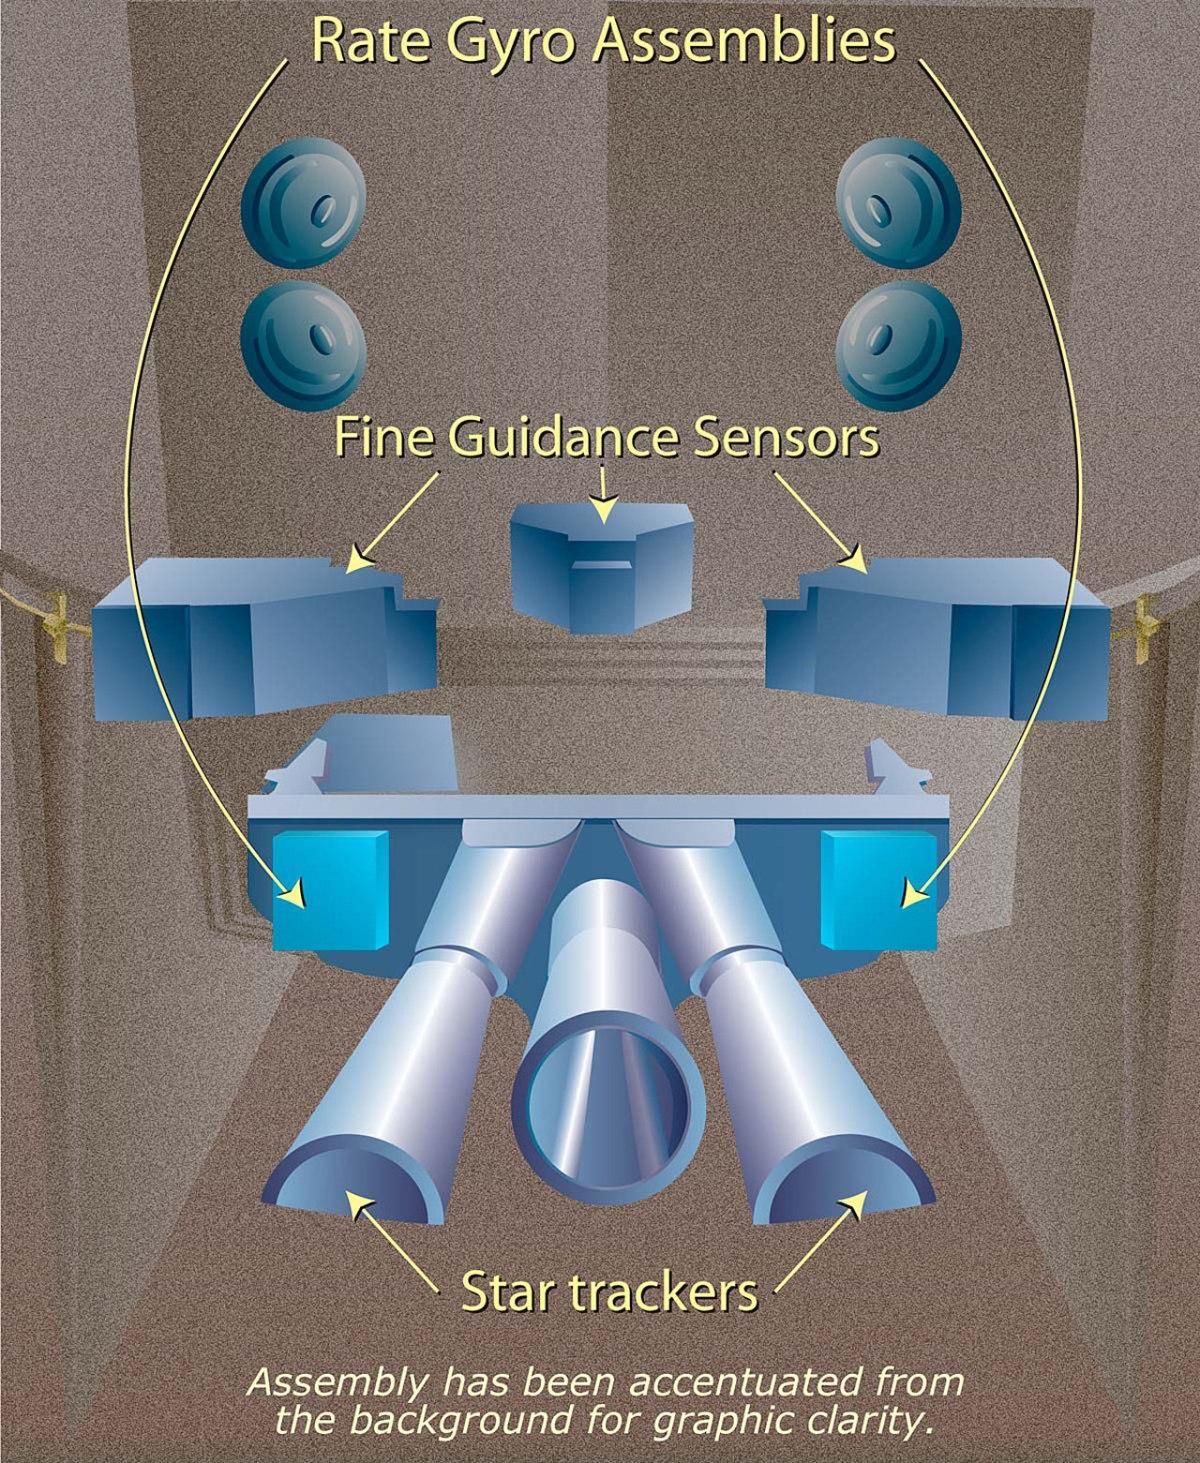 Hubble Space Telescope rate gyro assemblies